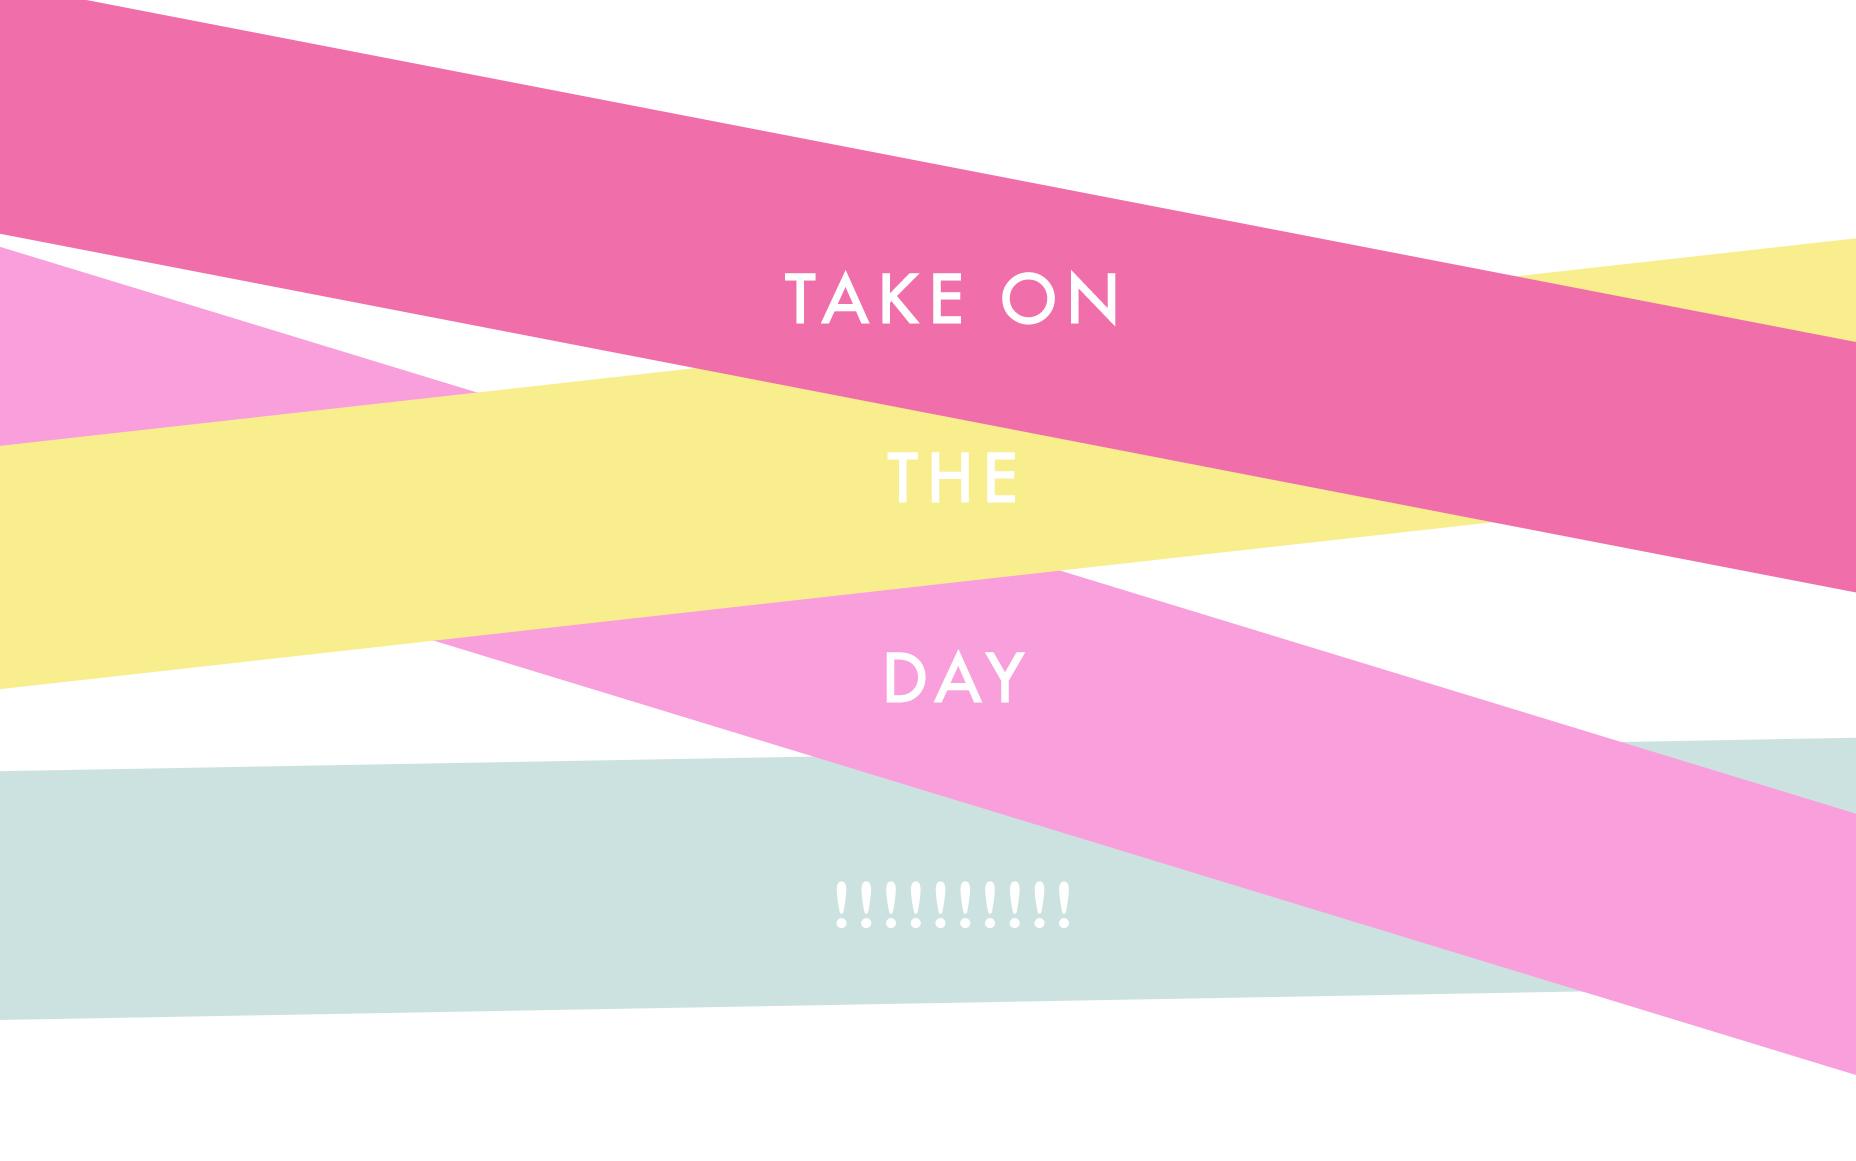 Tumblr Pink Wallpaper Hd For Pc HD Wallpaper